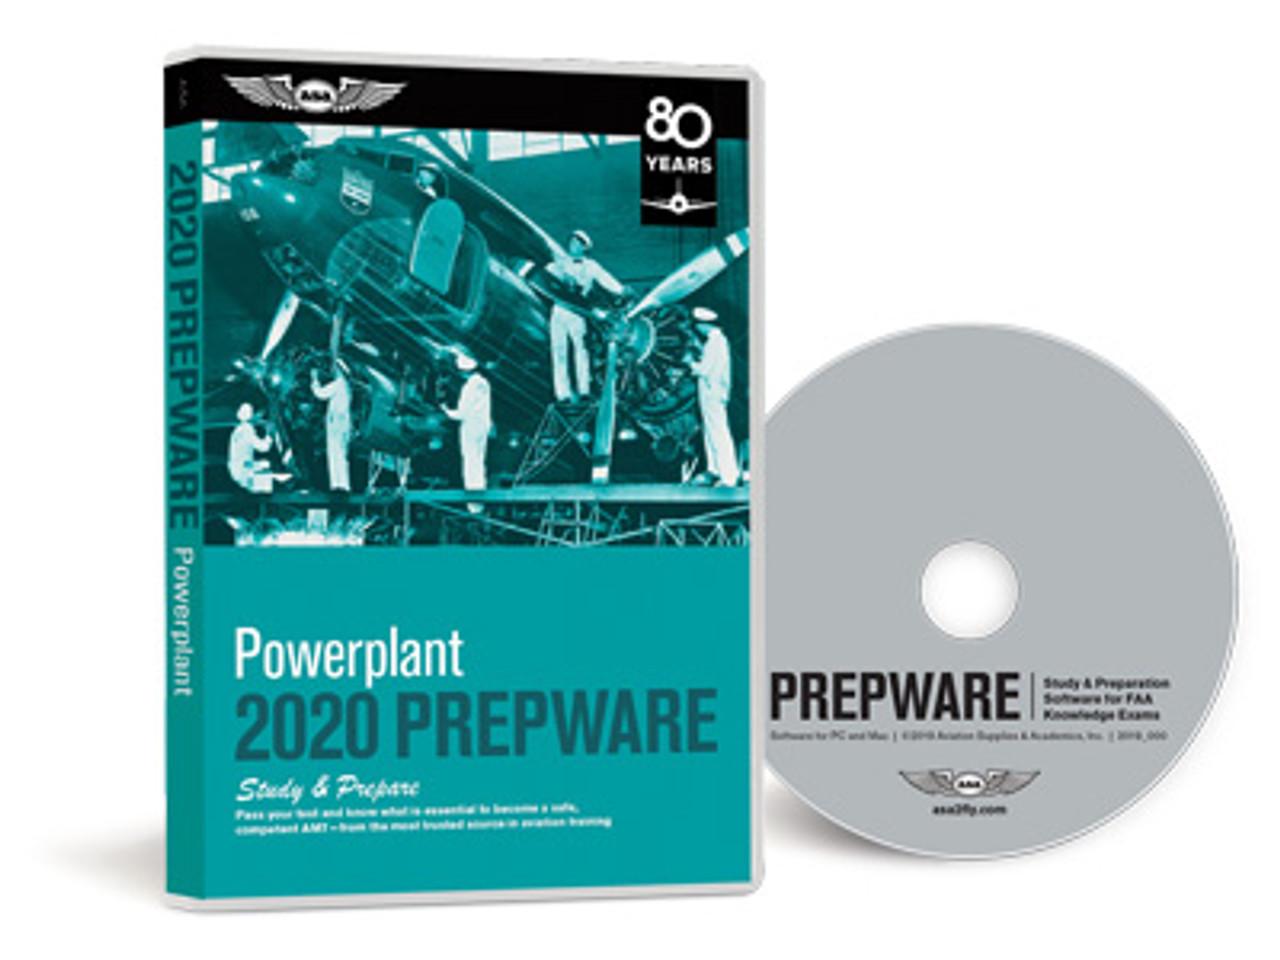 ASA AMT Powerplant Prepware 2020